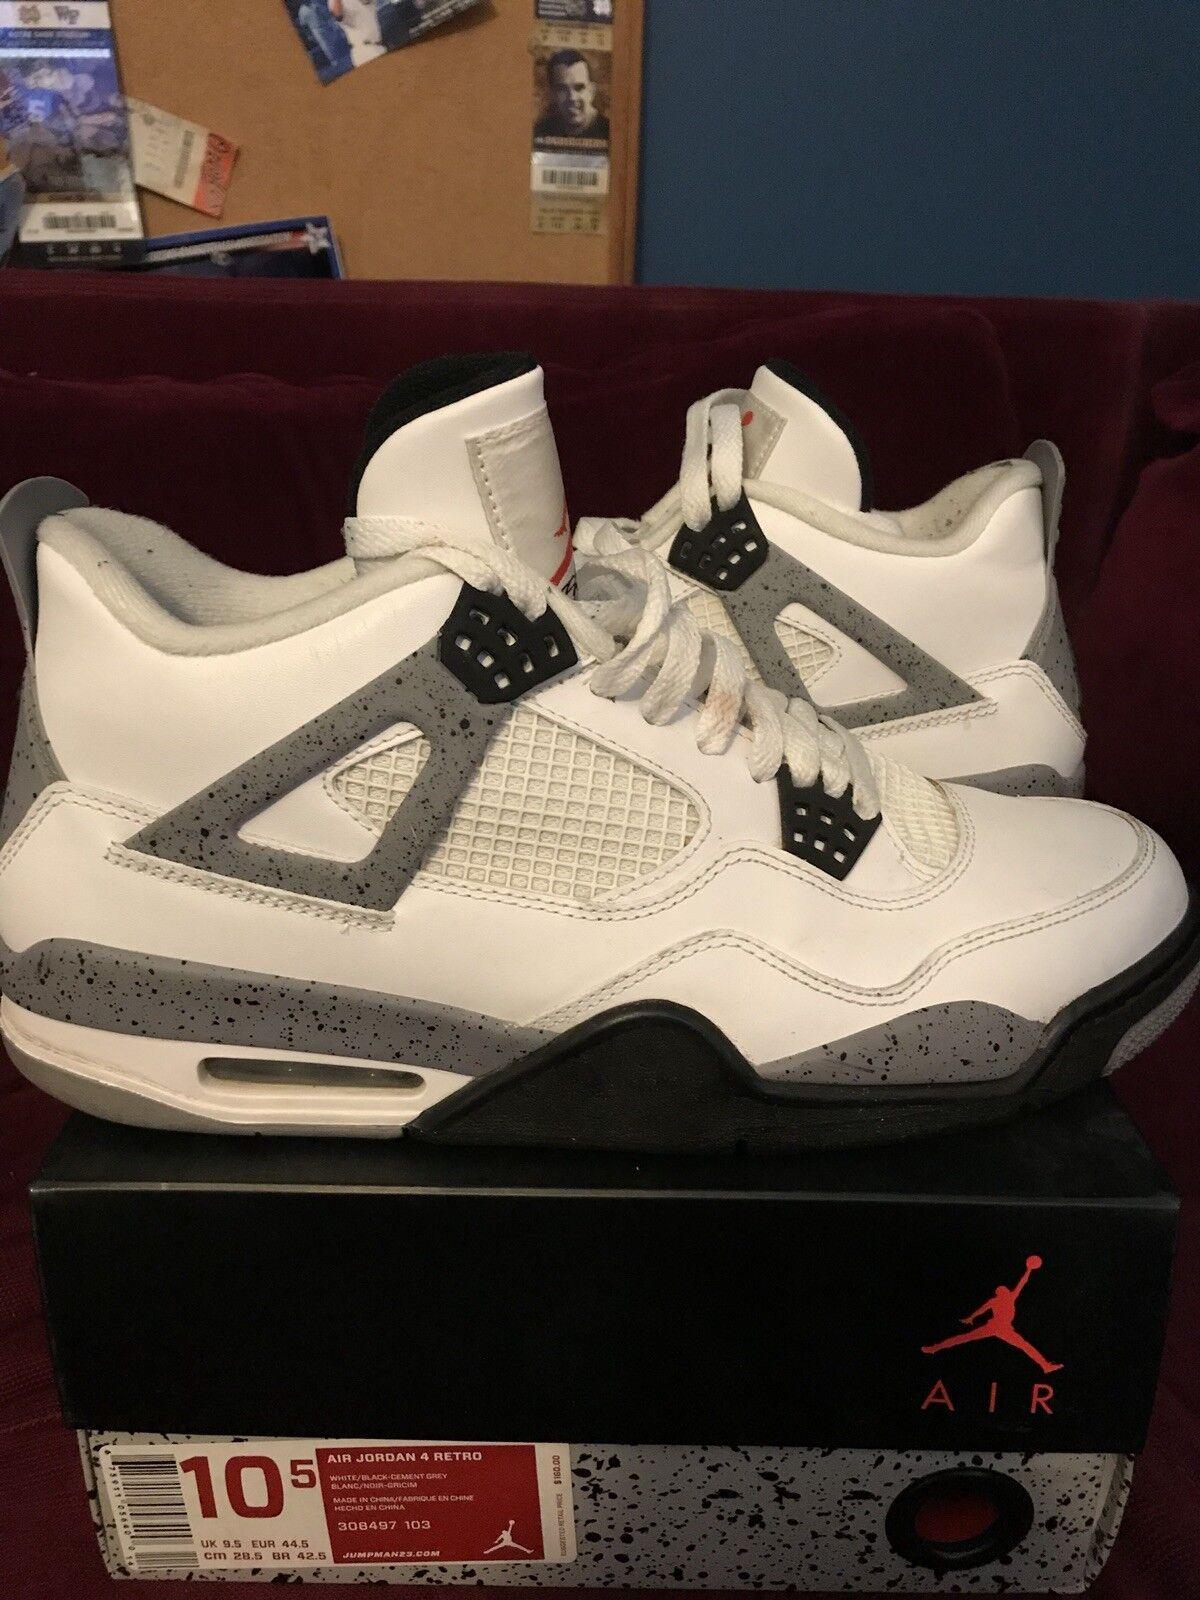 Nike air jordan uomini (2012) 4 cemento bianco scarpe da basket - dimensioni